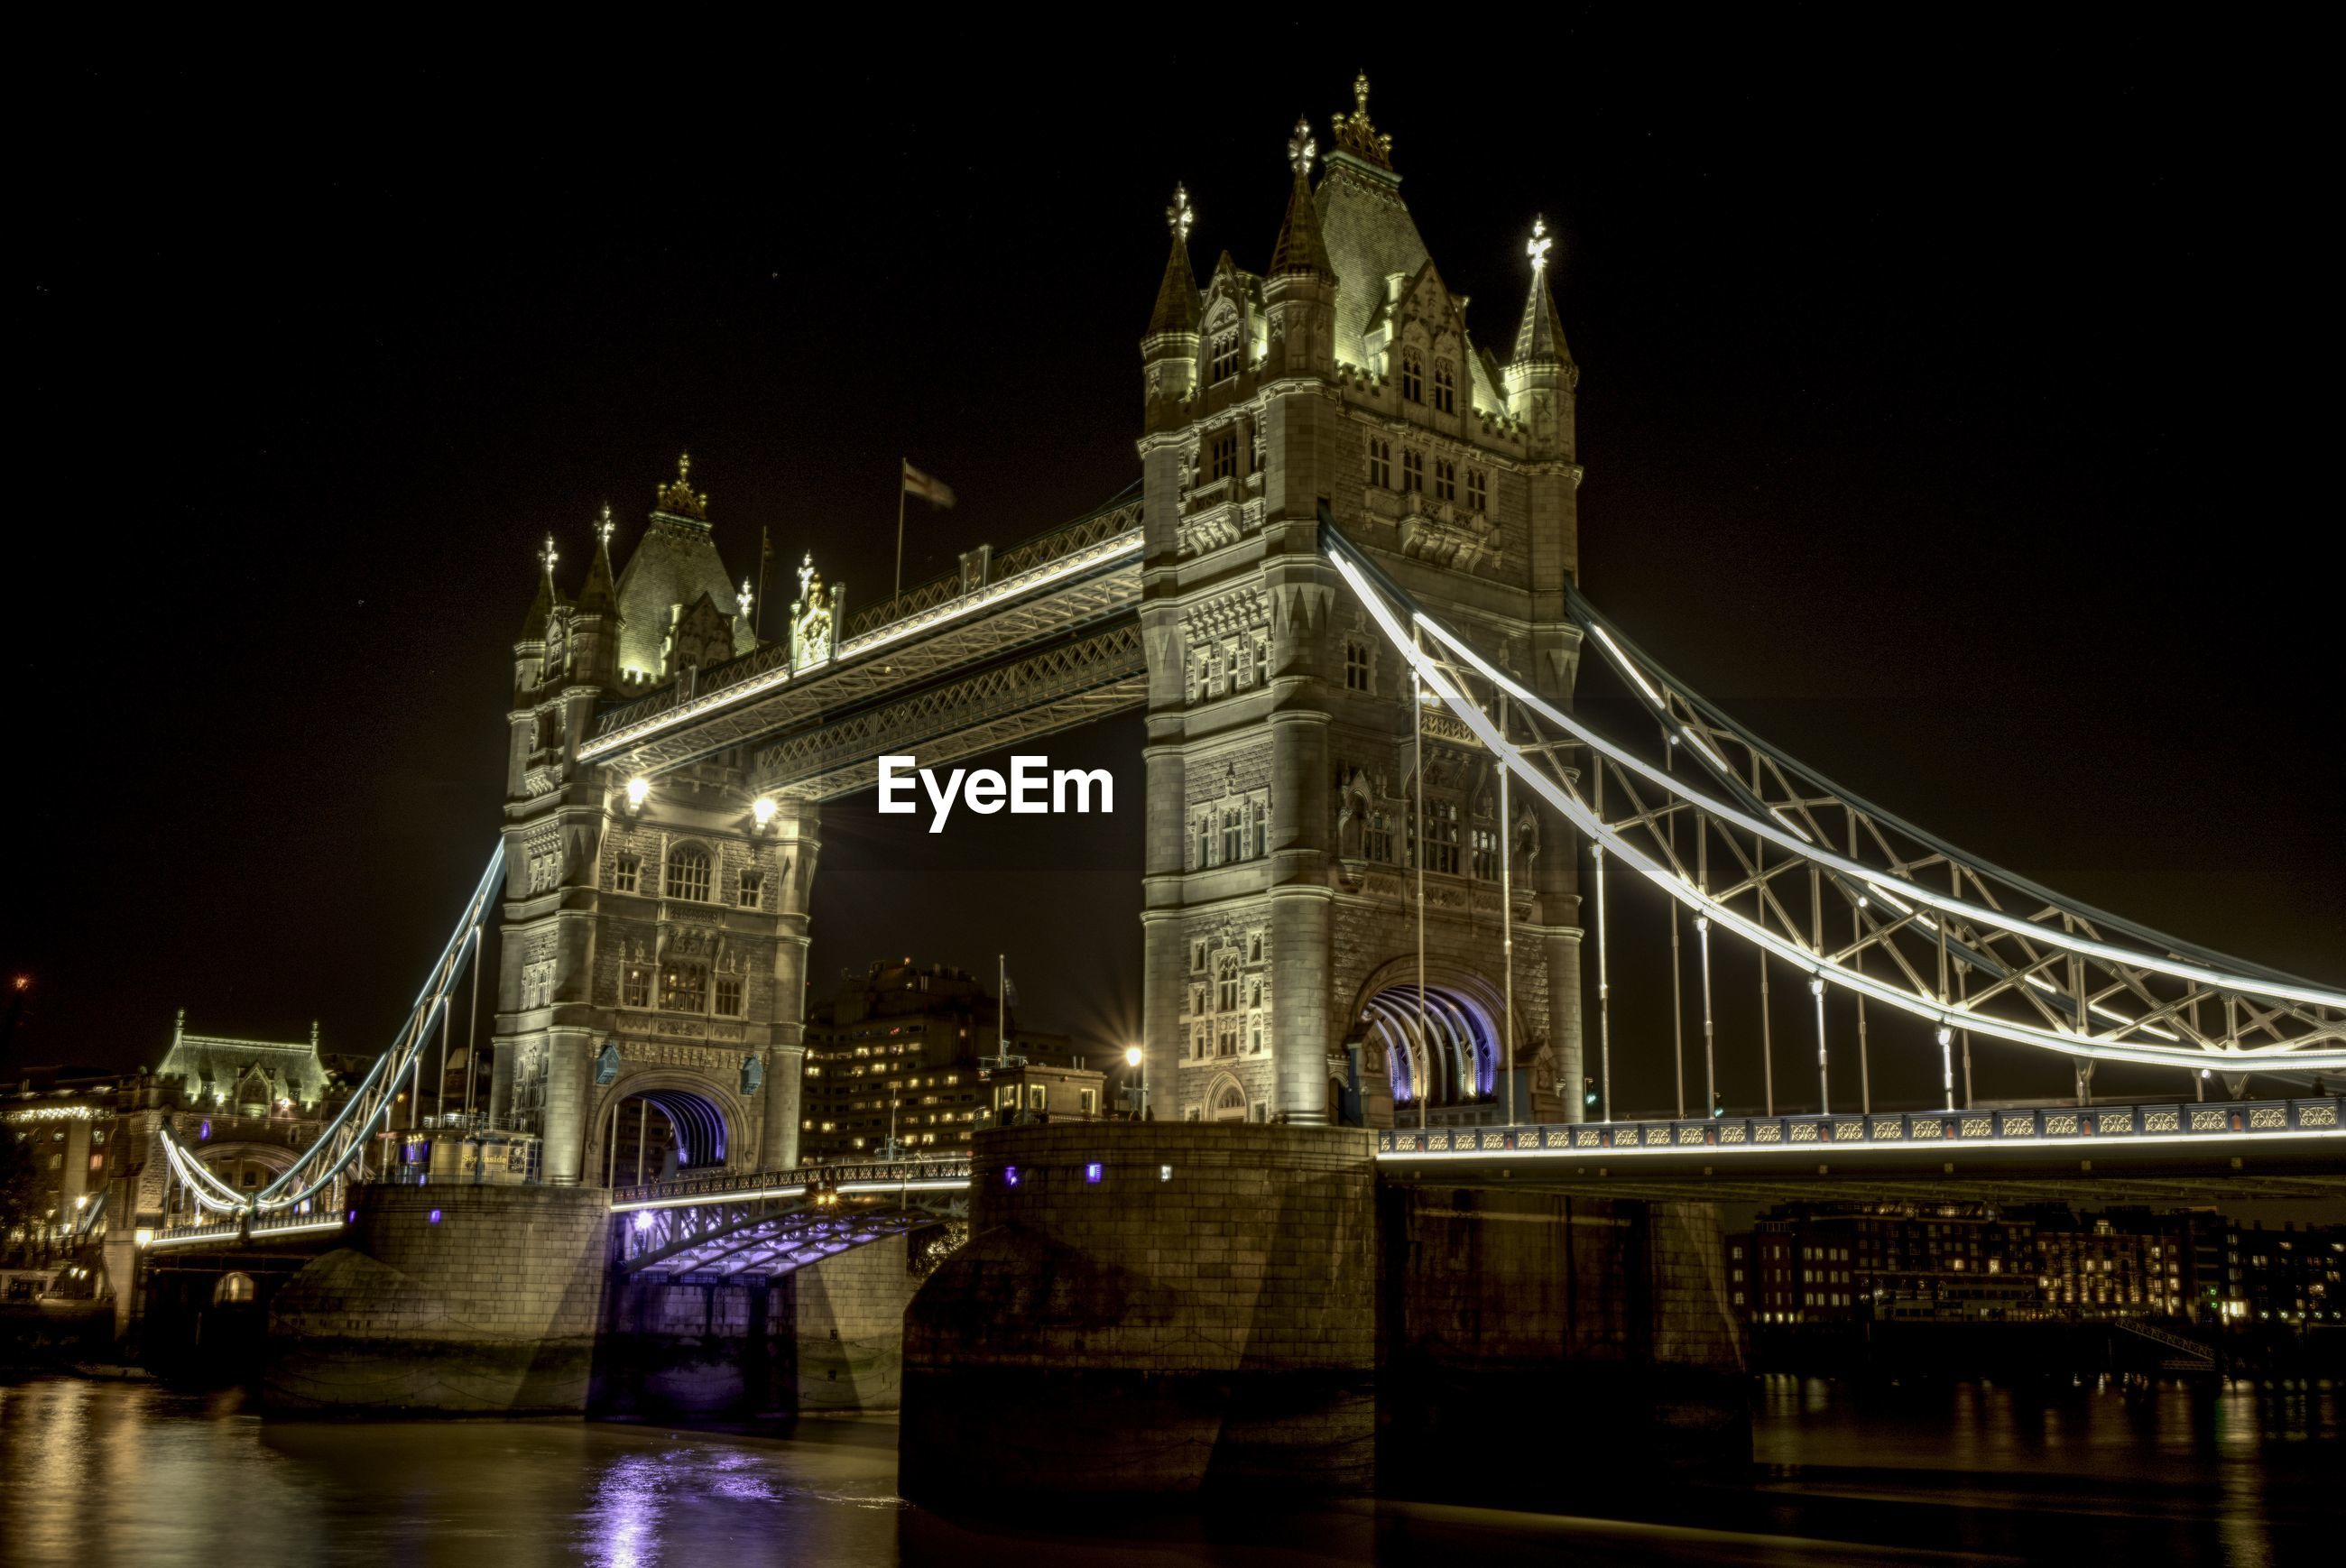 Illuminated tower bridge over river against at night